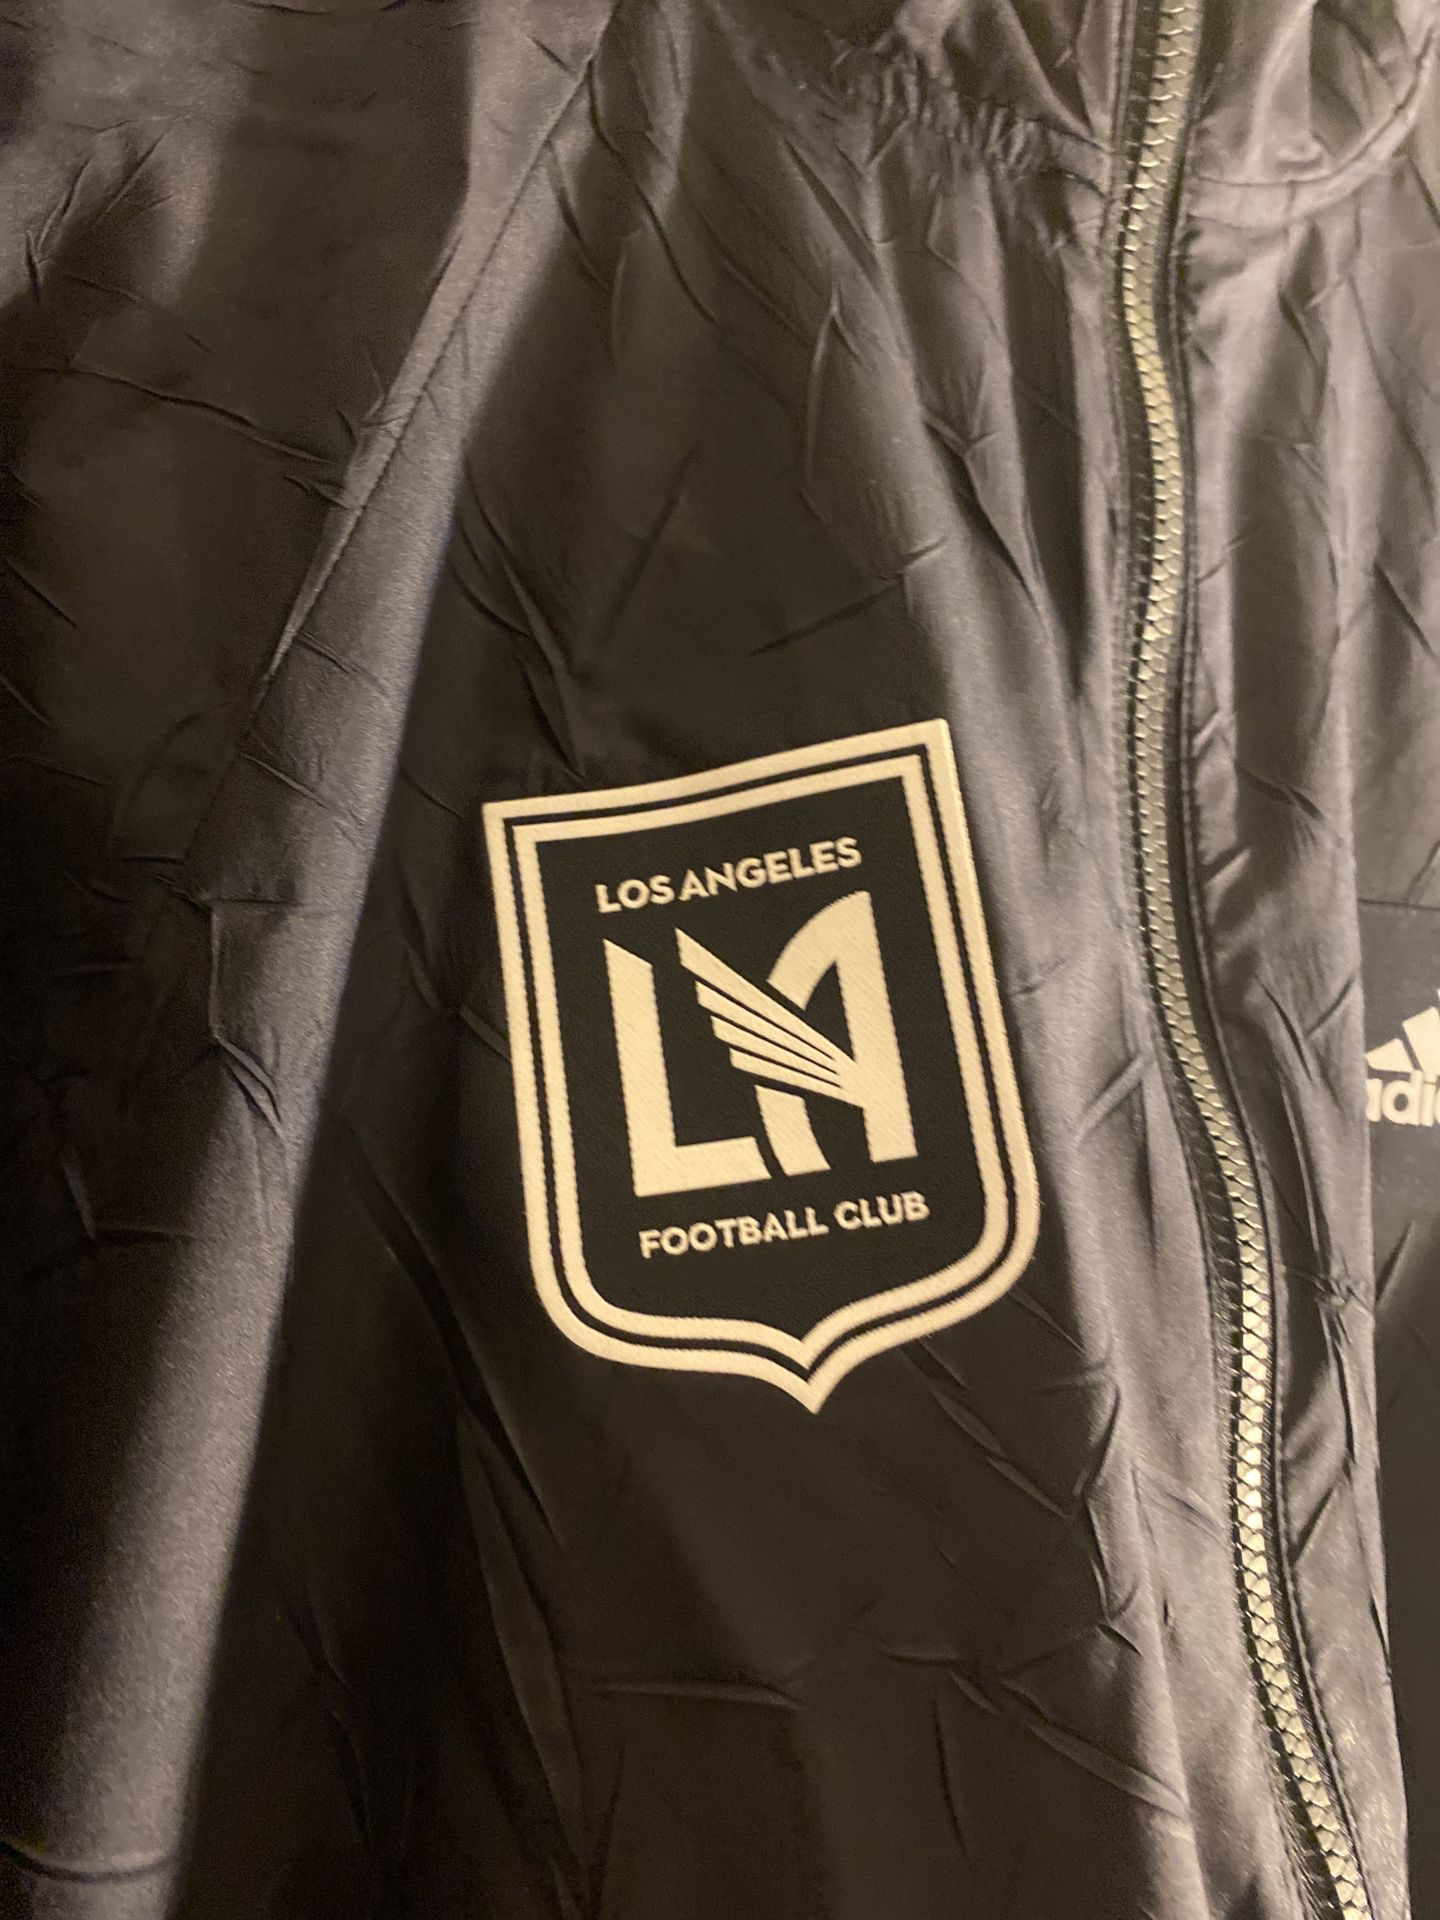 Adidas Los Angeles Football Club Wind Breaker Jacket Retail $120